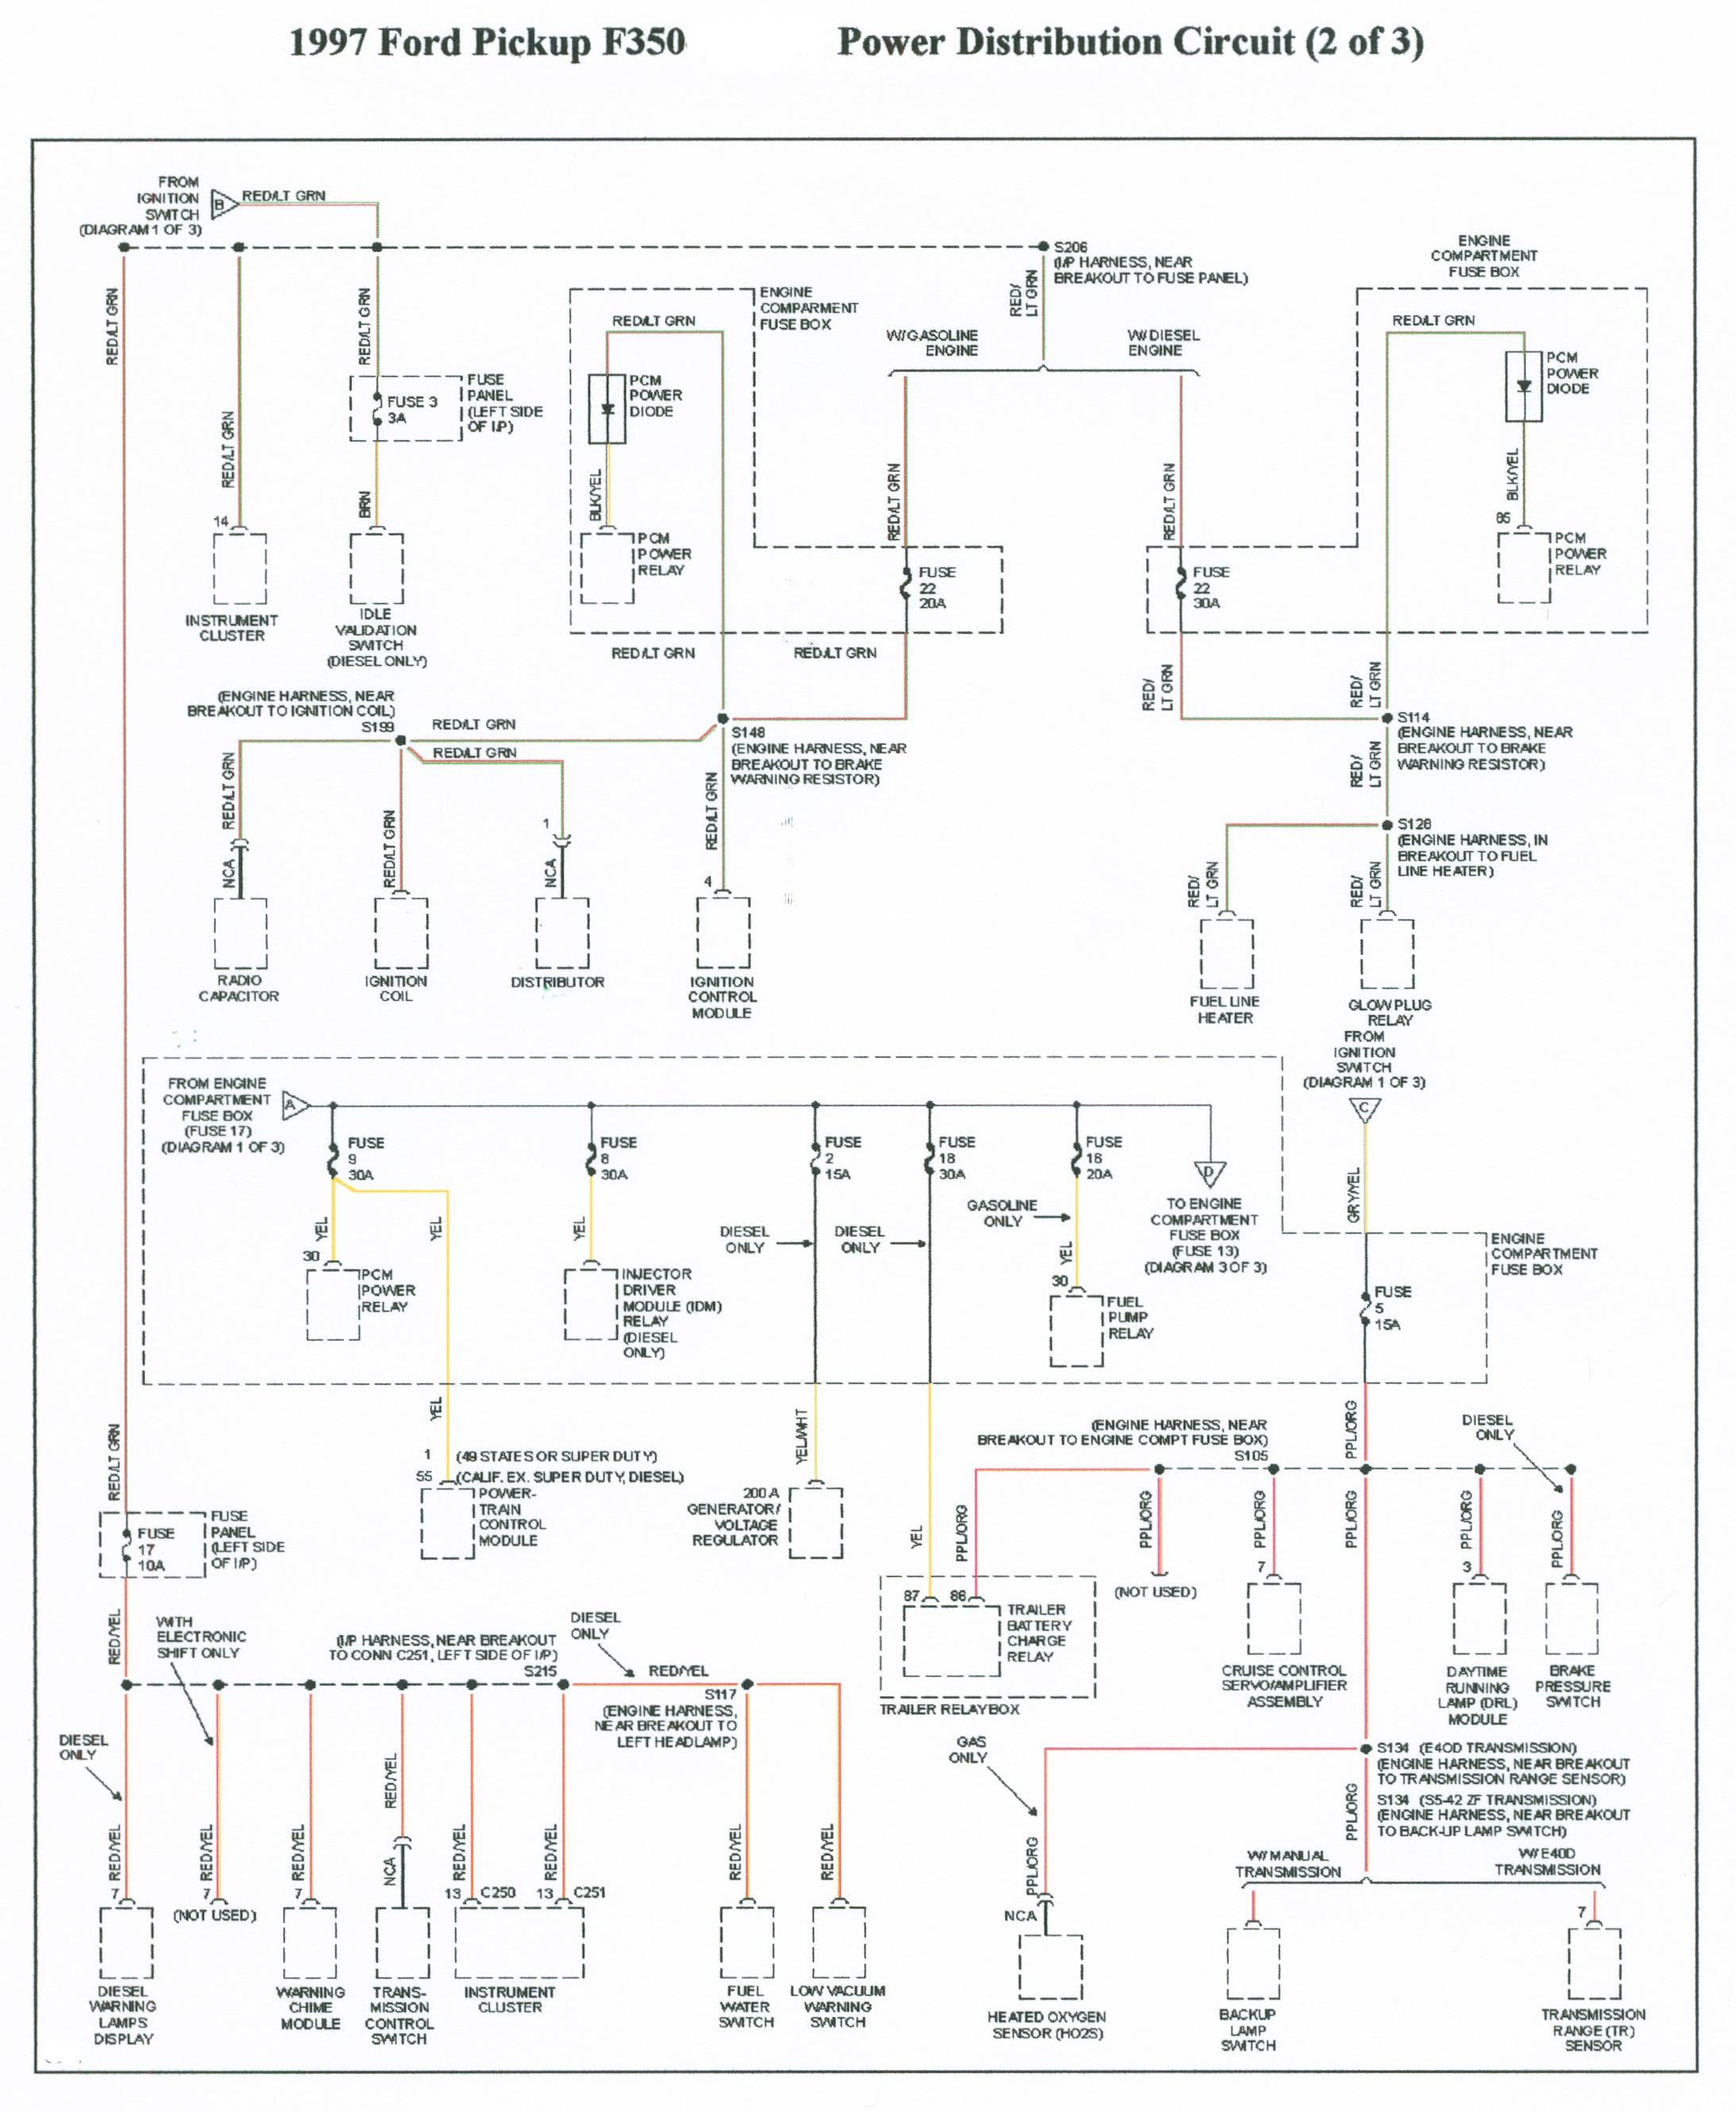 91 7 3 Idi Glow Plug Relay Wiring Diagram